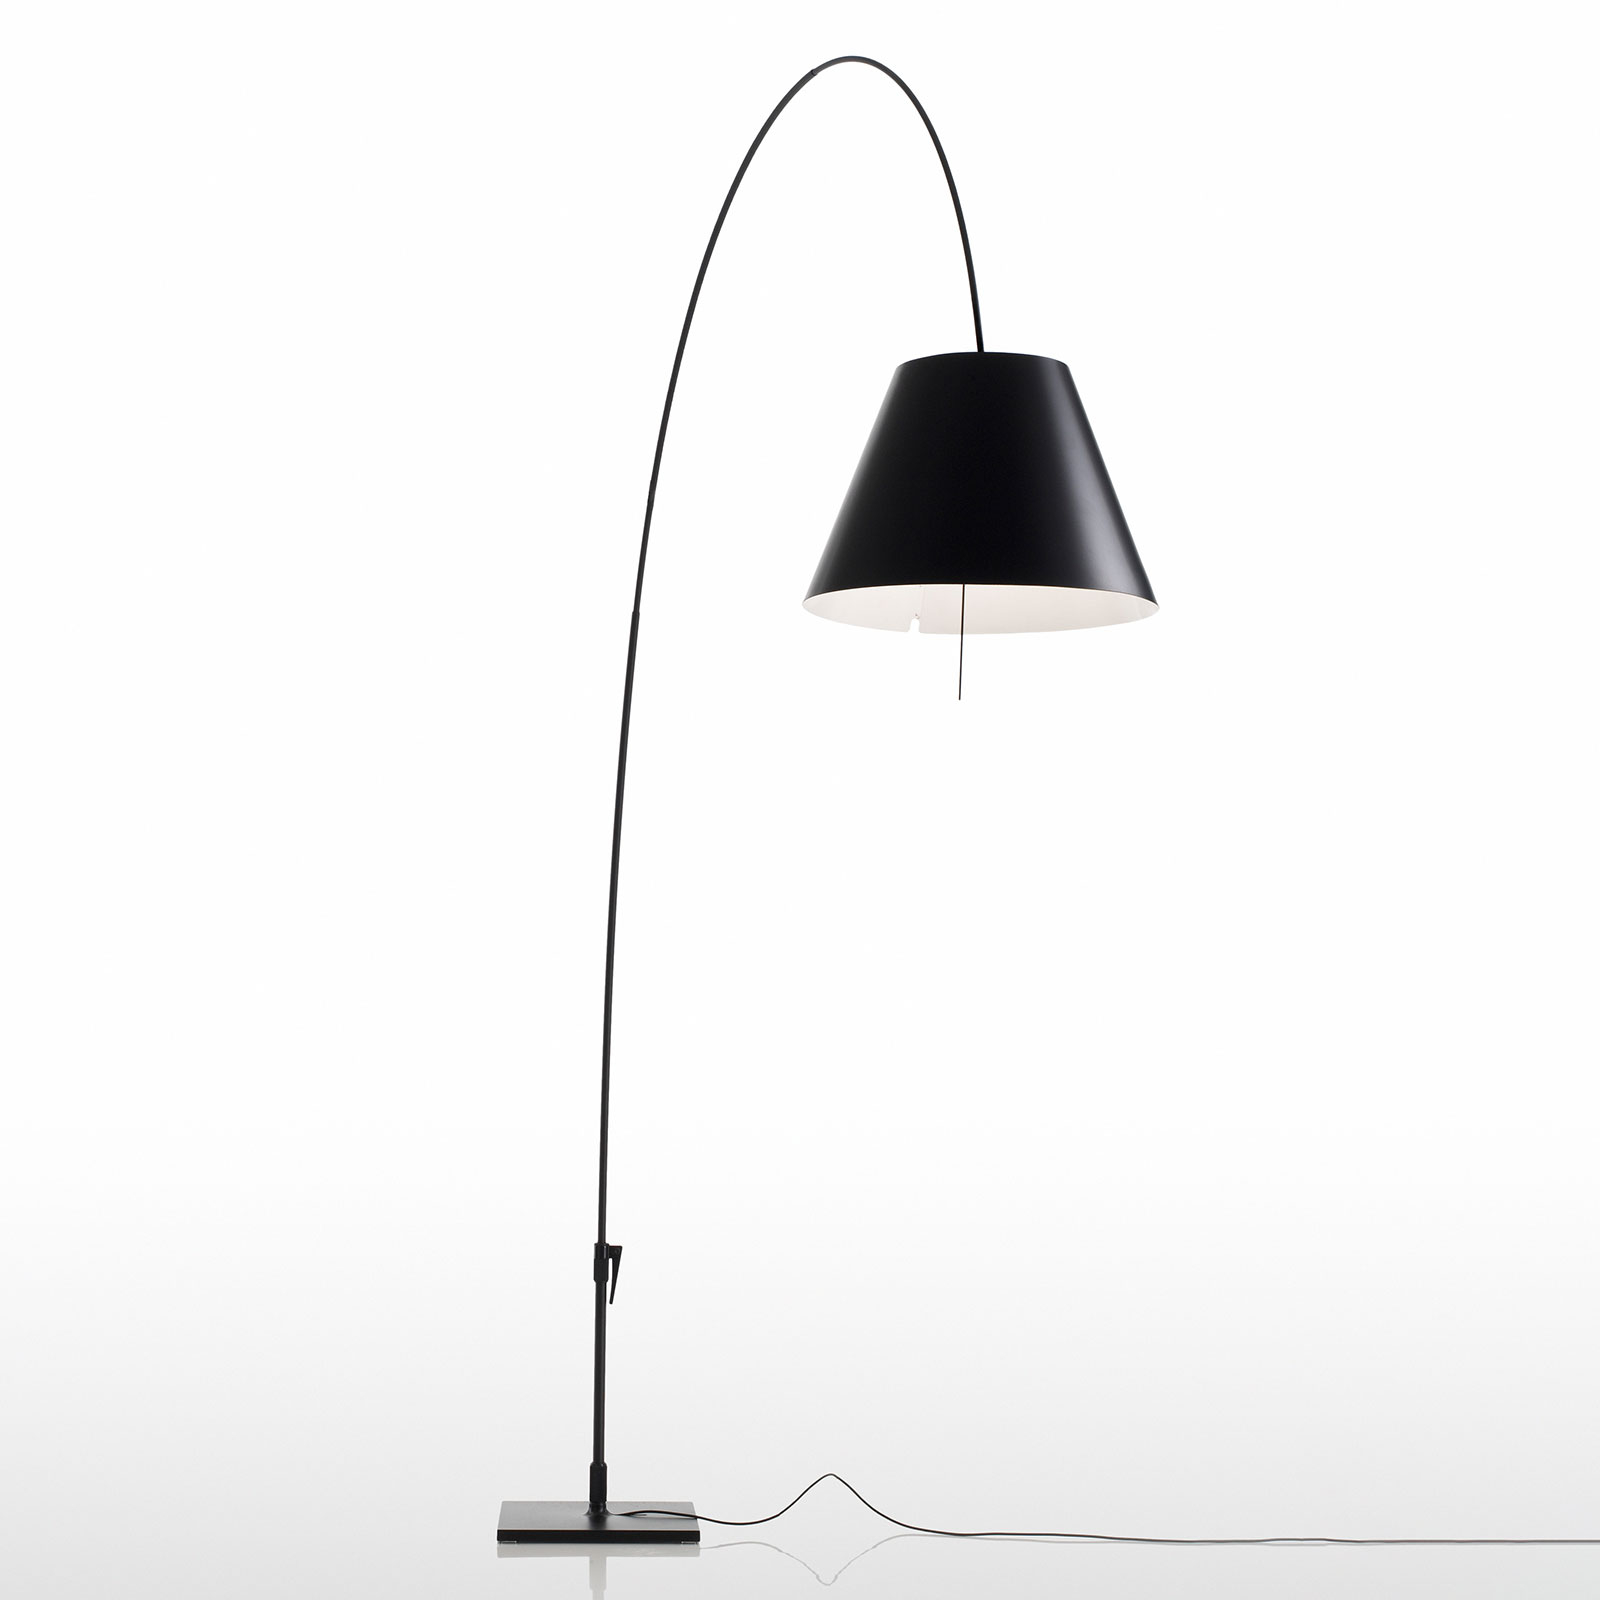 Luceplan Lady Costanza lampa stojąca D13E d czarna